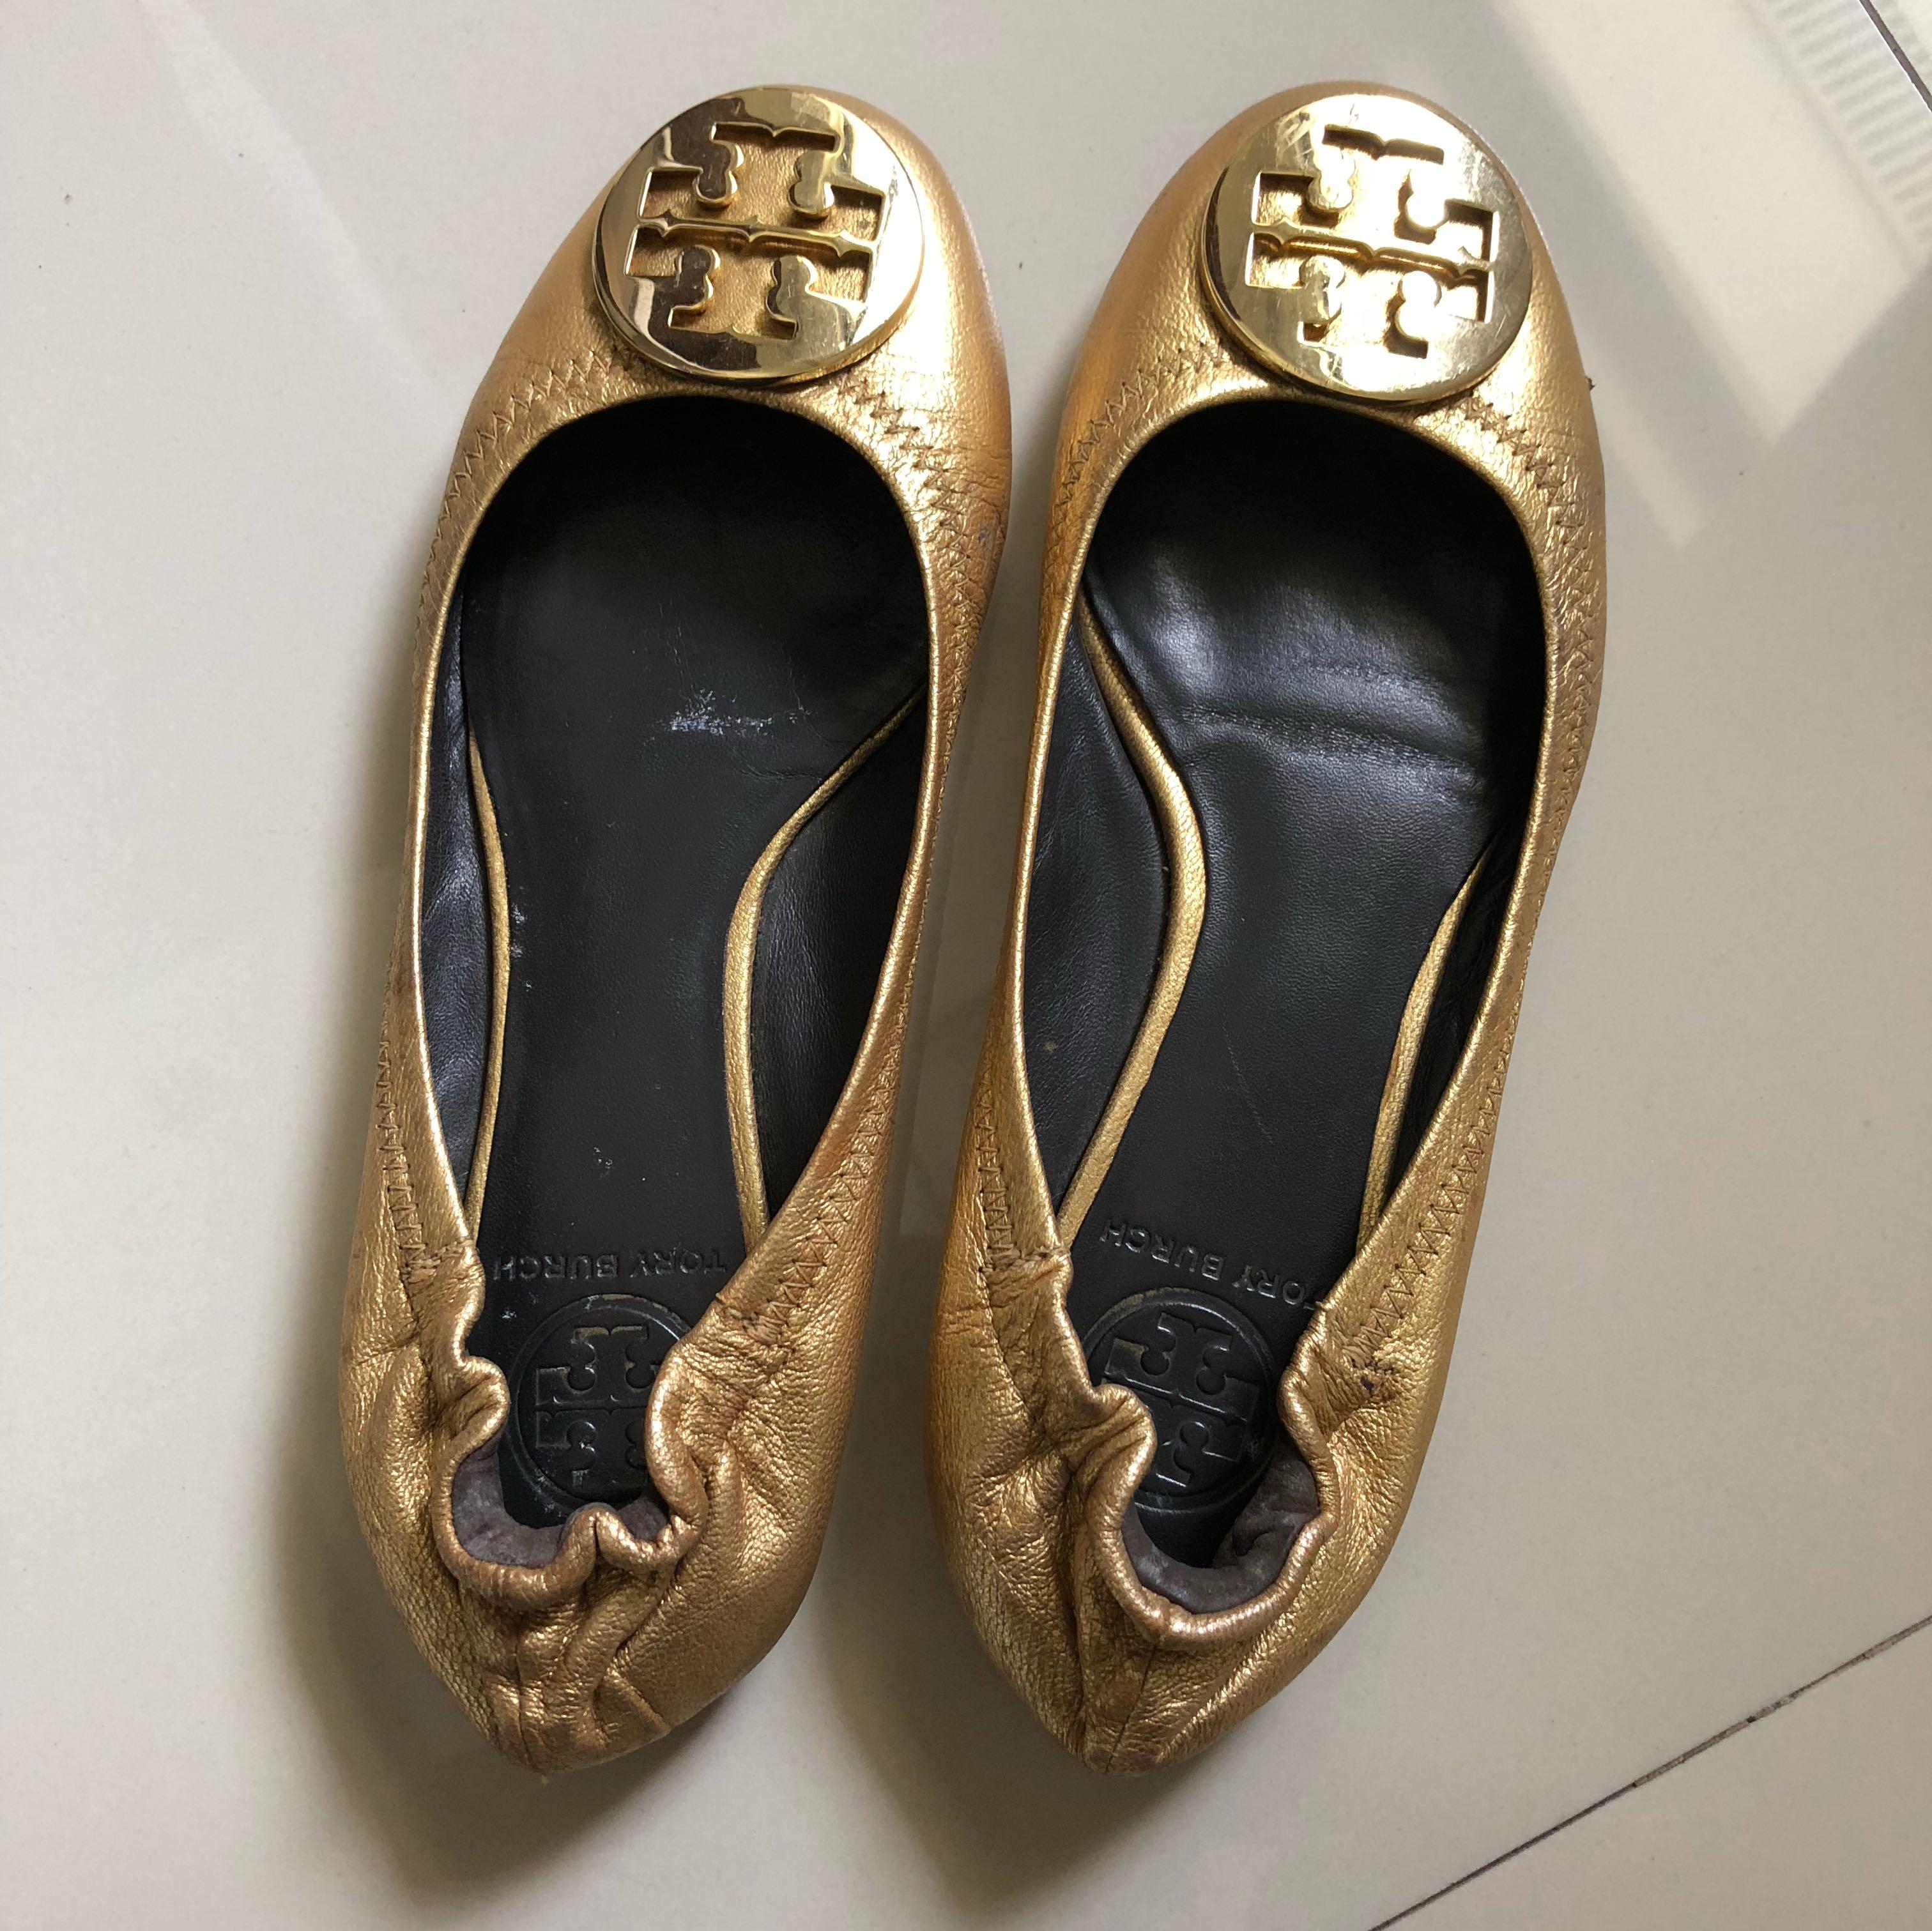 7610ff1fa14 Authentic Tory Burch Reva Gold Size 7